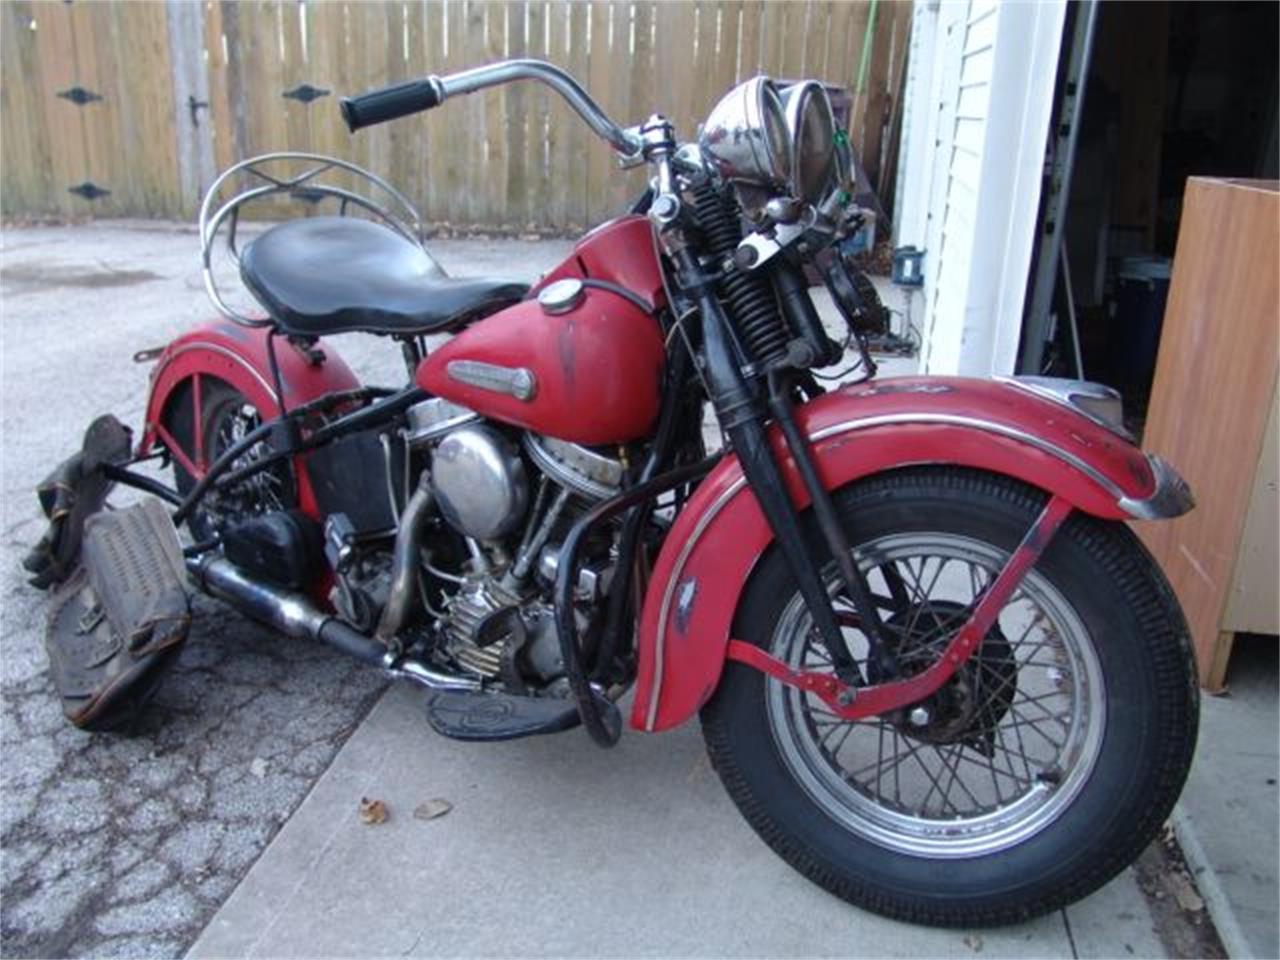 Harley Davidson Michigan >> 1948 Harley Davidson Panhead For Sale Classiccars Com Cc 1193461